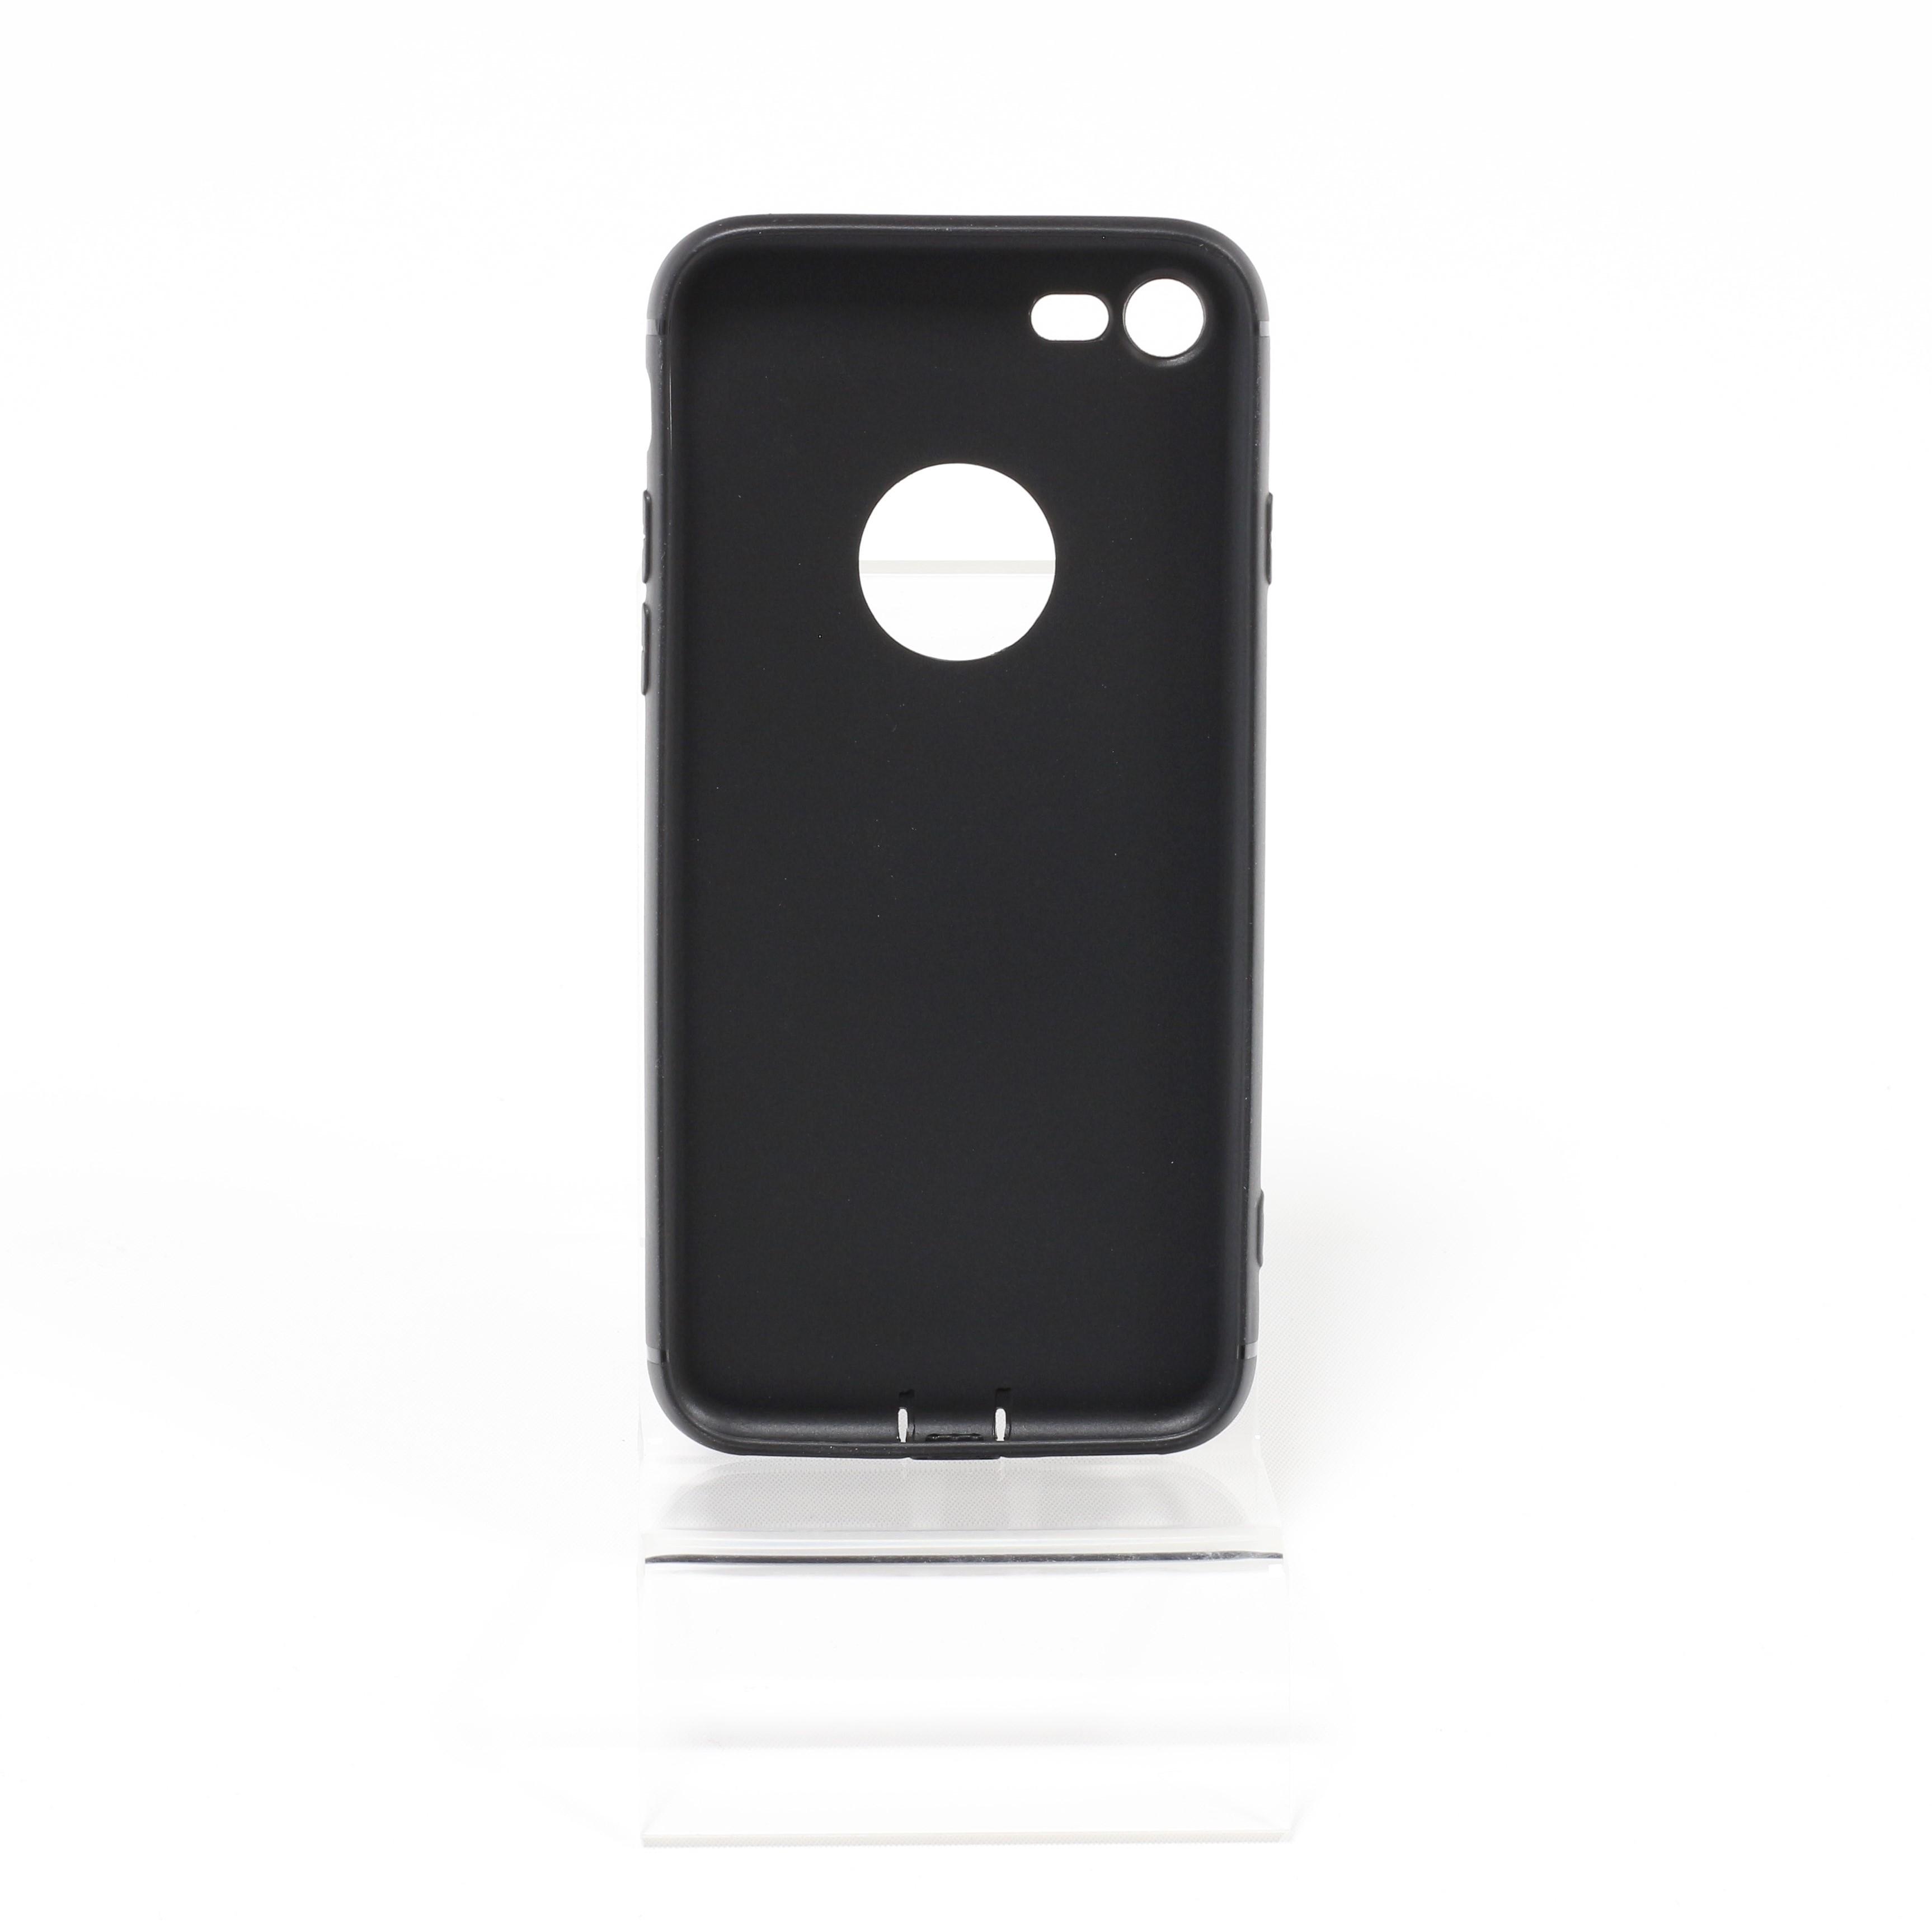 Ochranný kryt pro Apple iPhone 7 - Černý